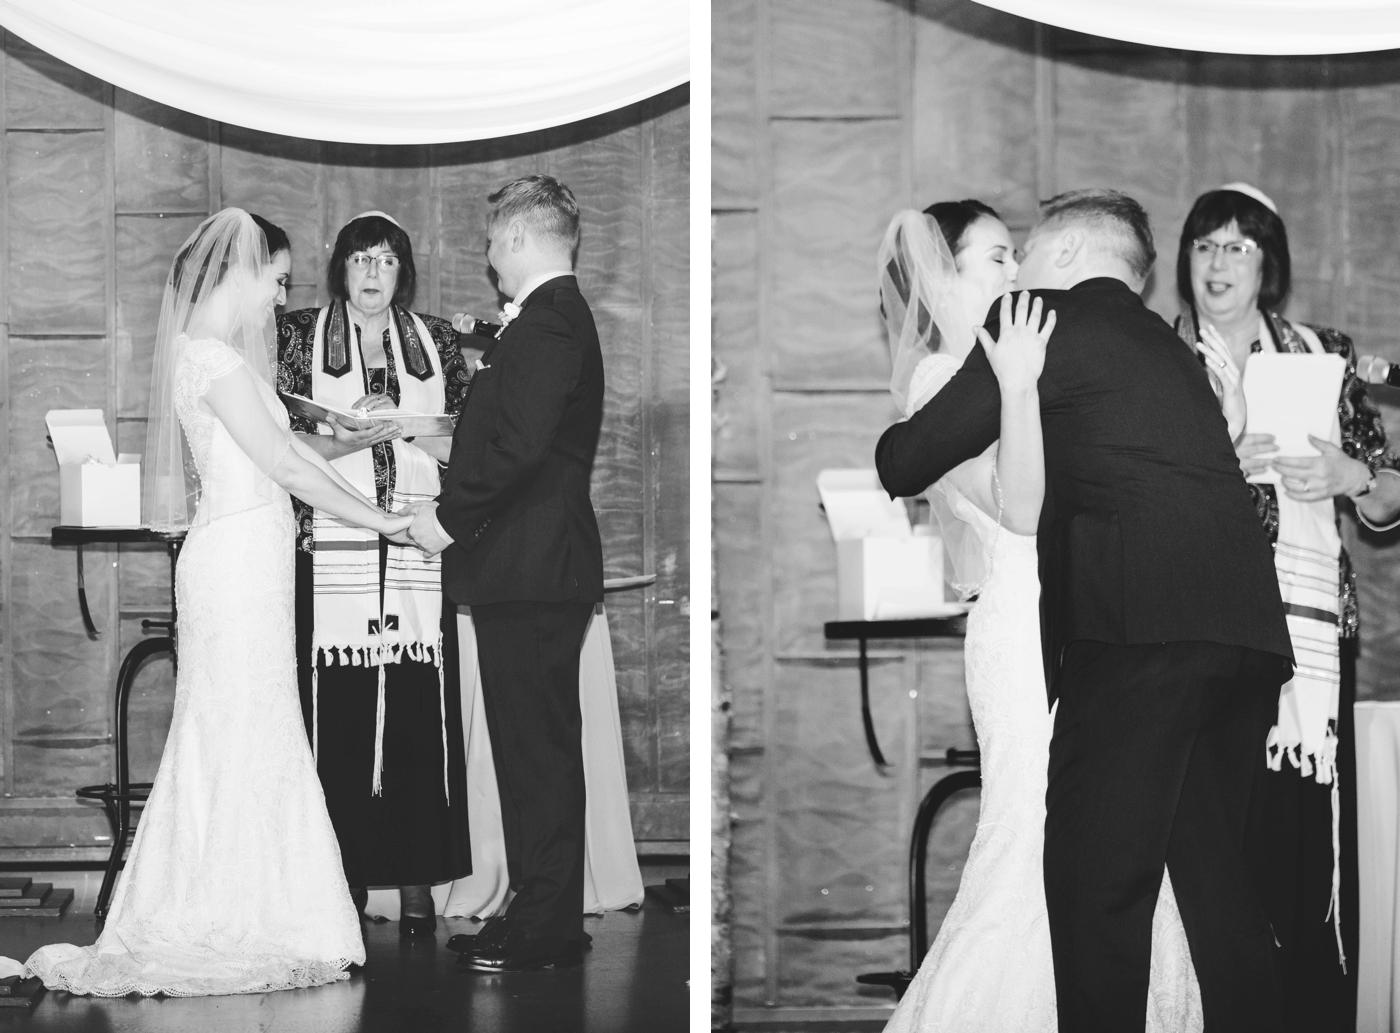 chicago-fine-art-wedding-photography-lintelman35